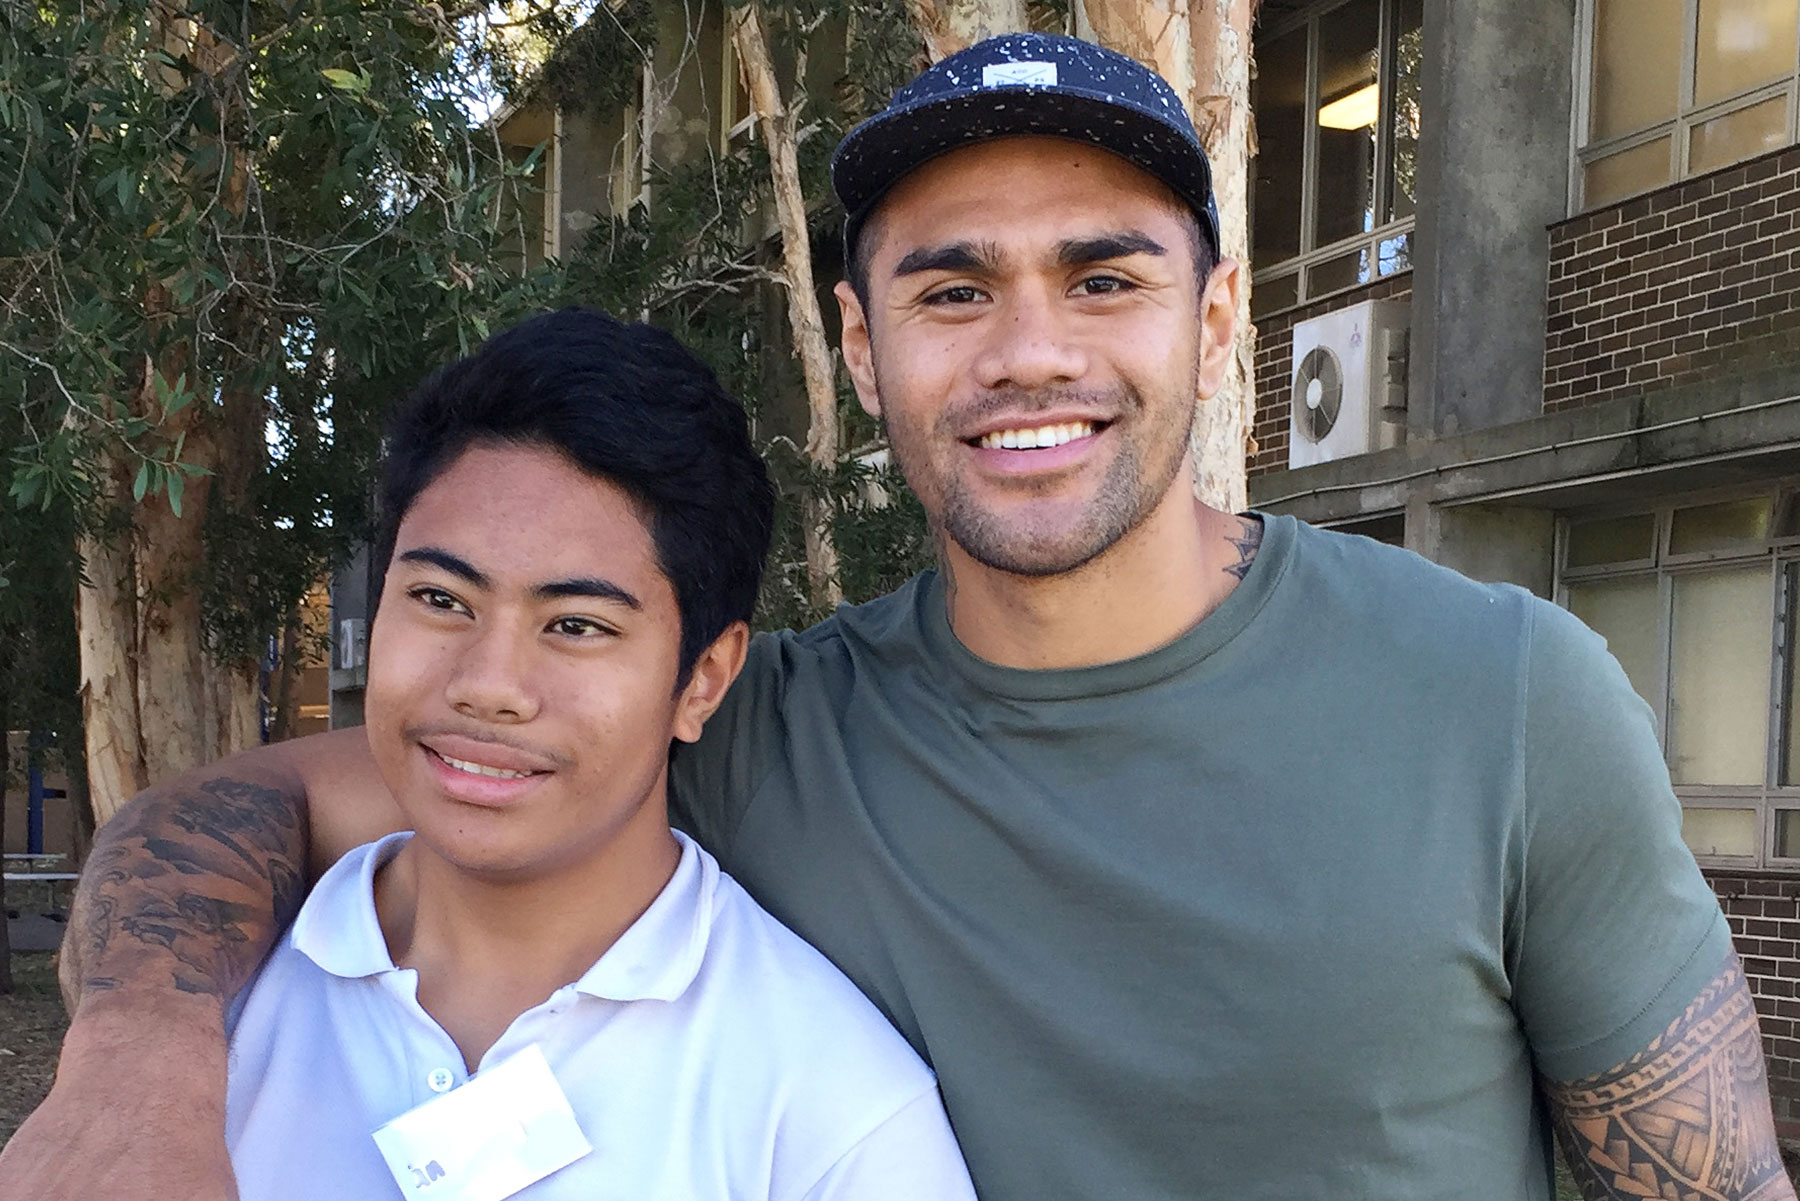 A Raise mentor and mentee. Raise has 1000 mentors and 1000 mentees around Australia.